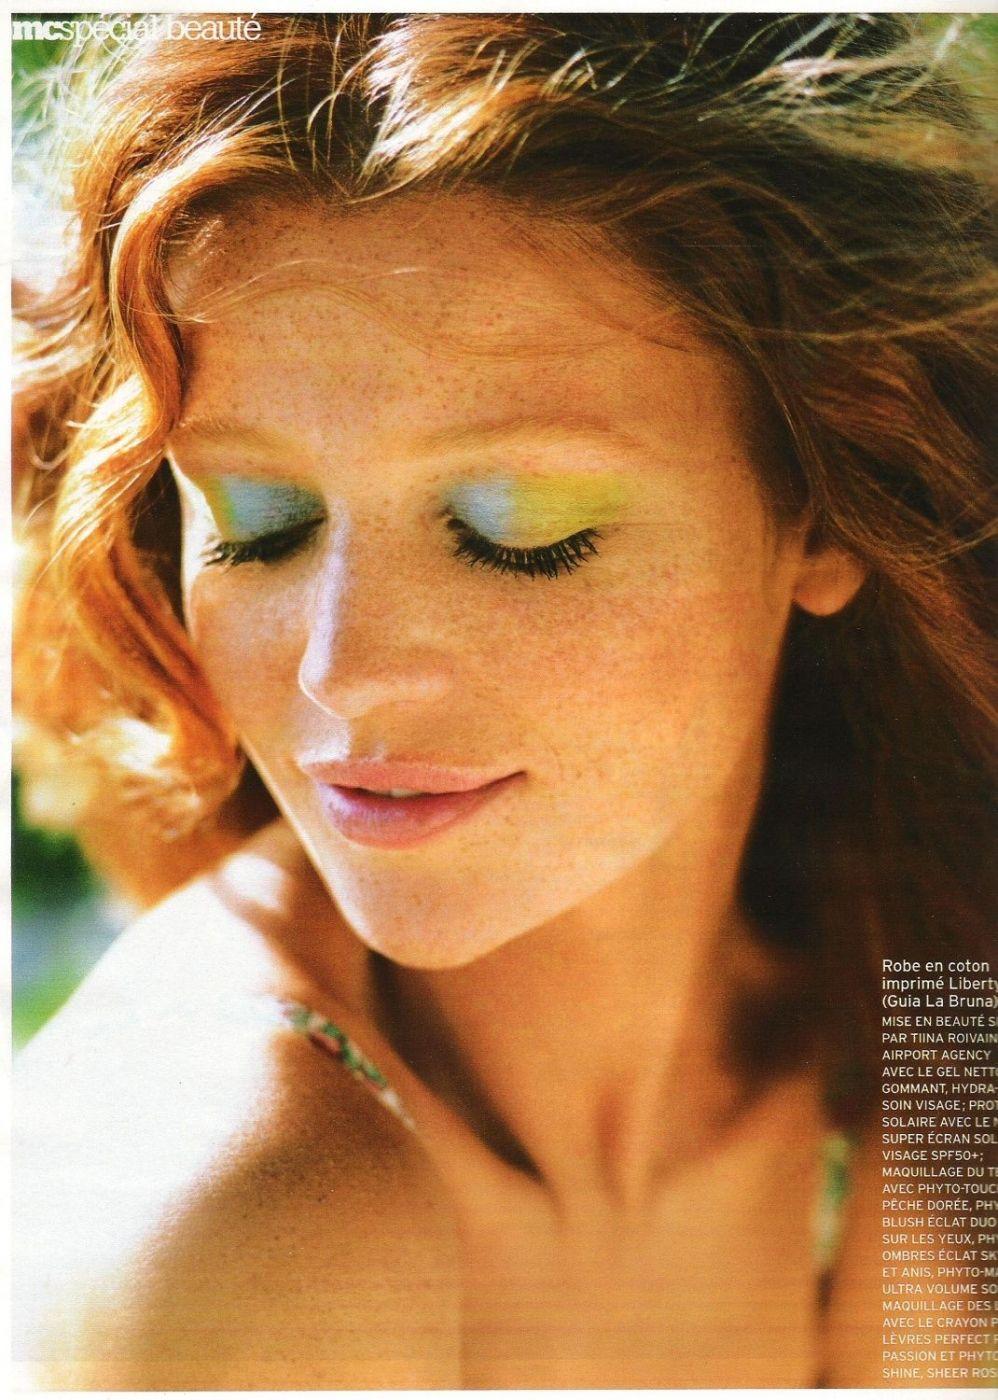 , two-tone eyes #makeup #model, Anja Rubik Blog, Anja Rubik Blog